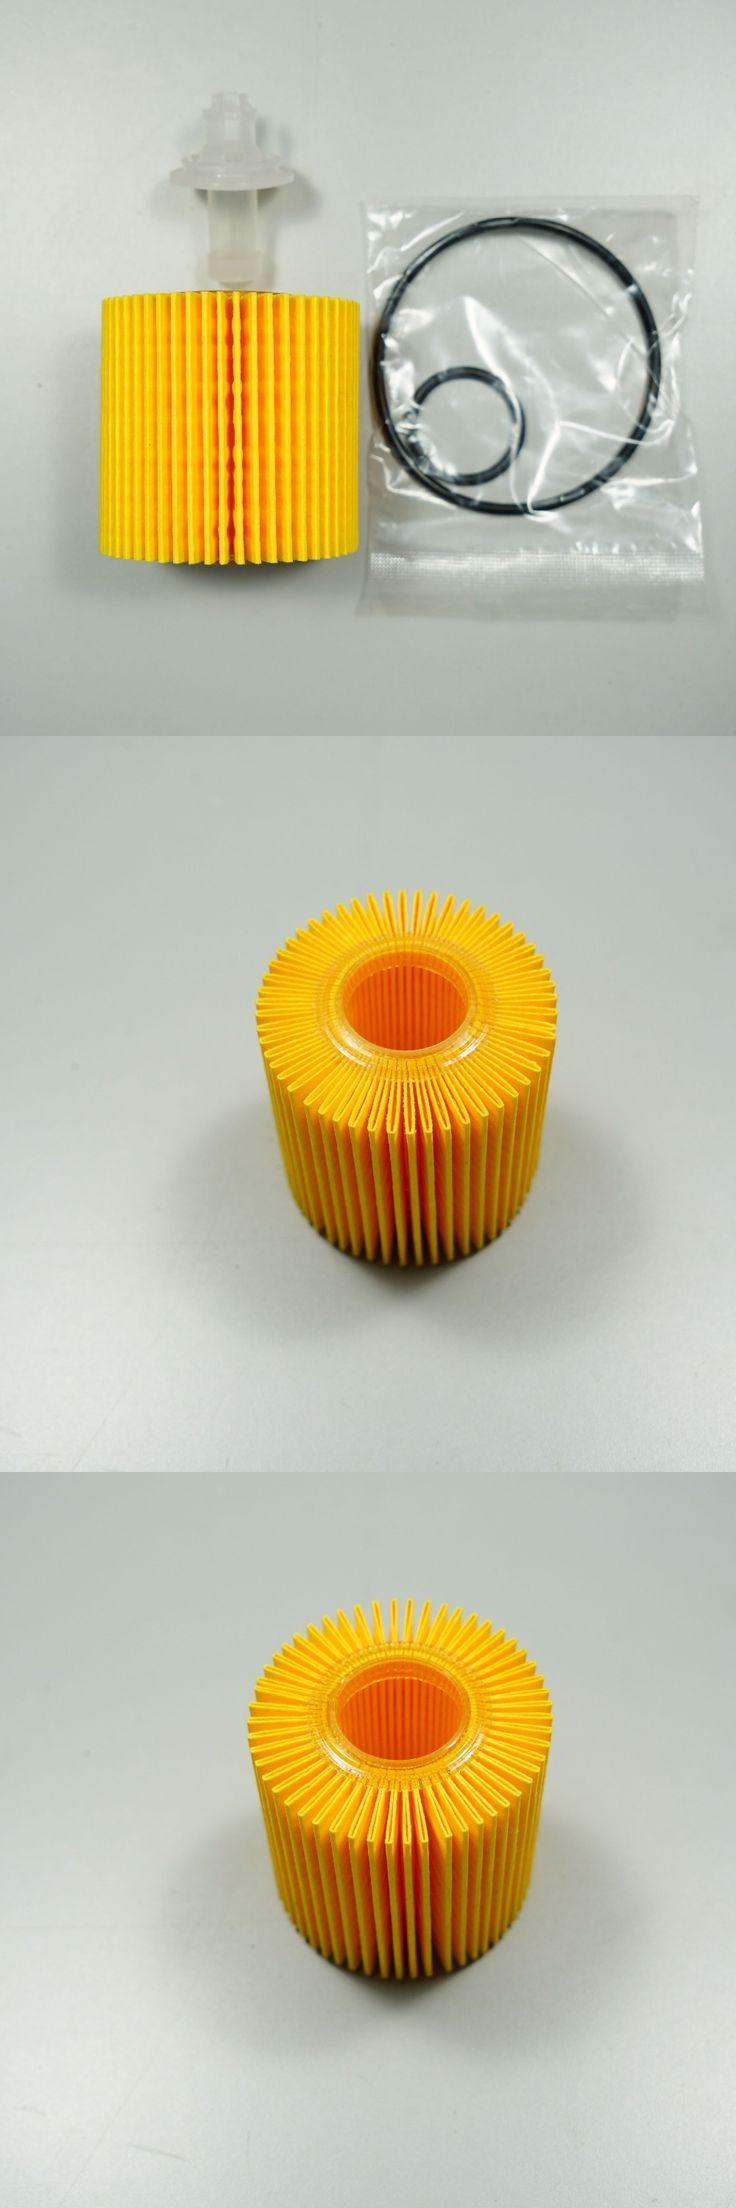 Oil Filter  for Toyota Lexus RX350, ES350, GS350, RS350, ACR50; 08 Toyota Previa; Highlander;2006 Previa ACR50 04152-31090 #RH31